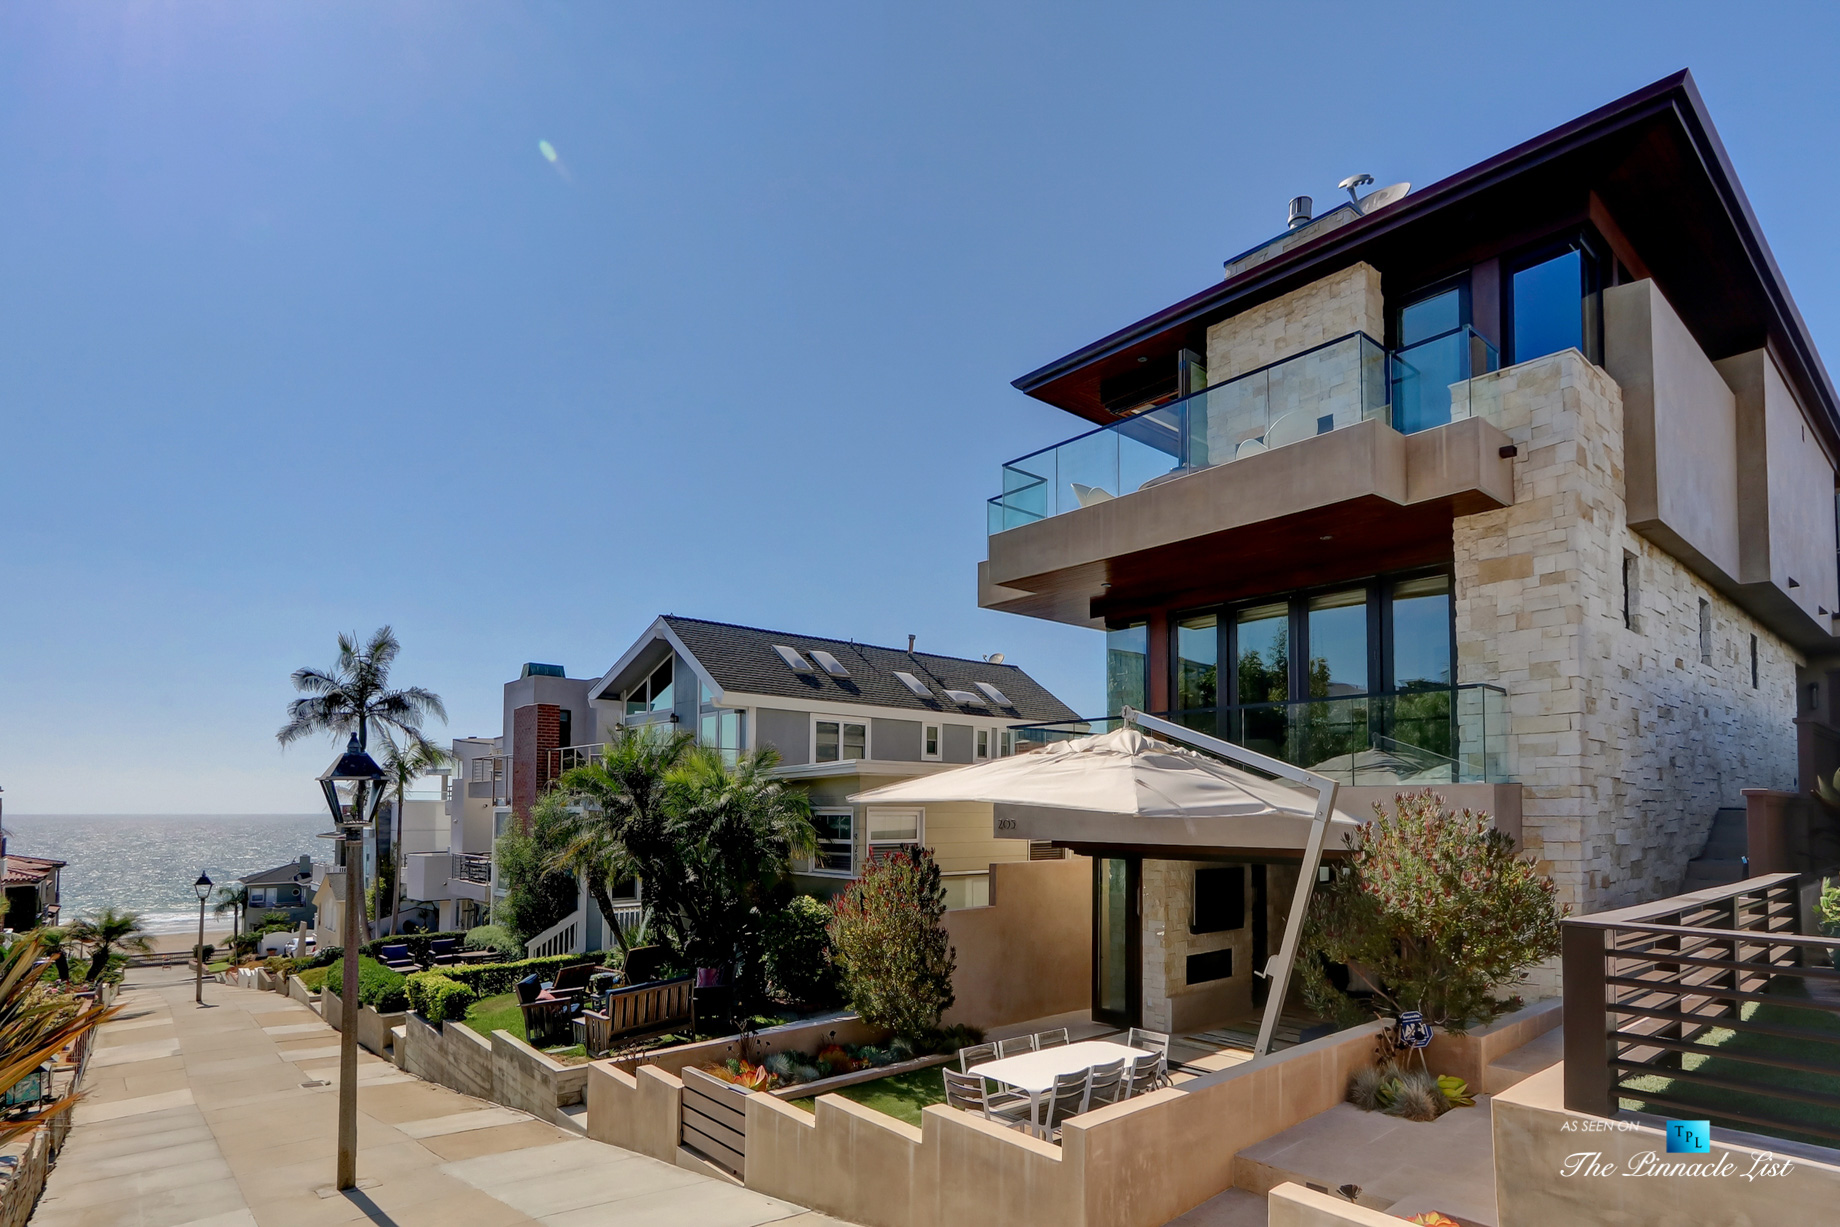 205 20th Street, Manhattan Beach, CA, USA - Front Street Exterior - Luxury Real Estate - Ocean View Home